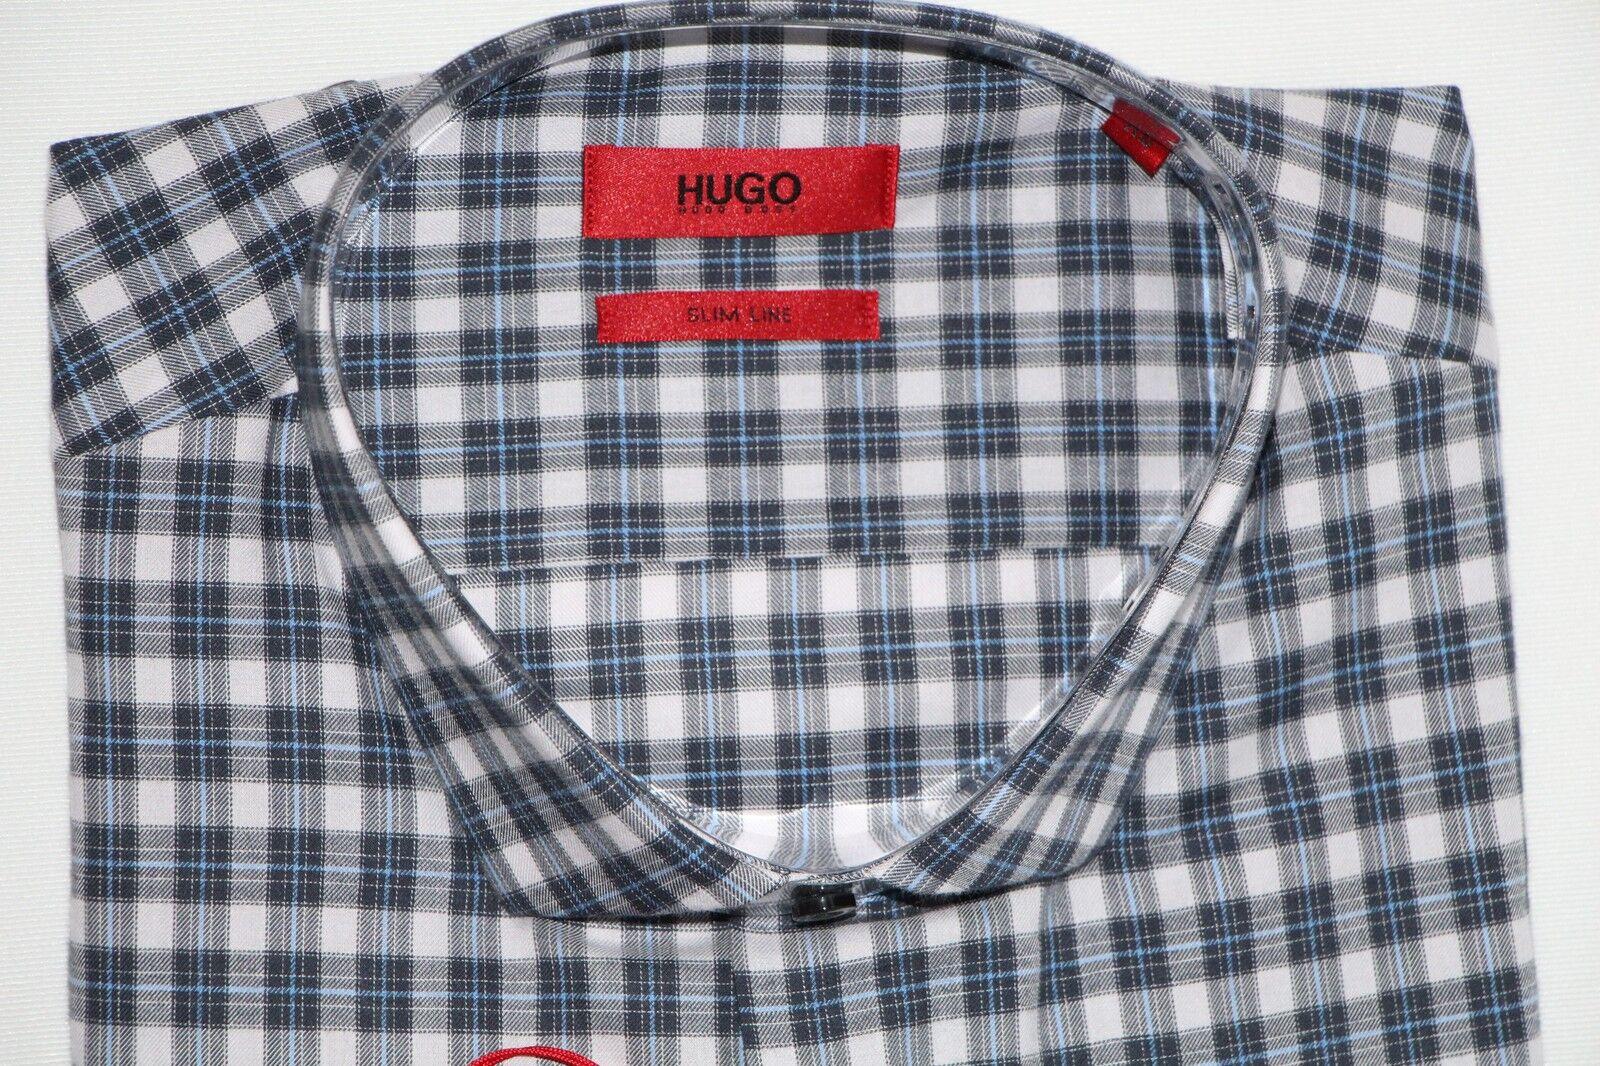 HUGO BOSS HEMD, Mod. Mod. Mod. Edmond, Gr. L, Slim Line, Navy | Diversified In Packaging  2f16fc